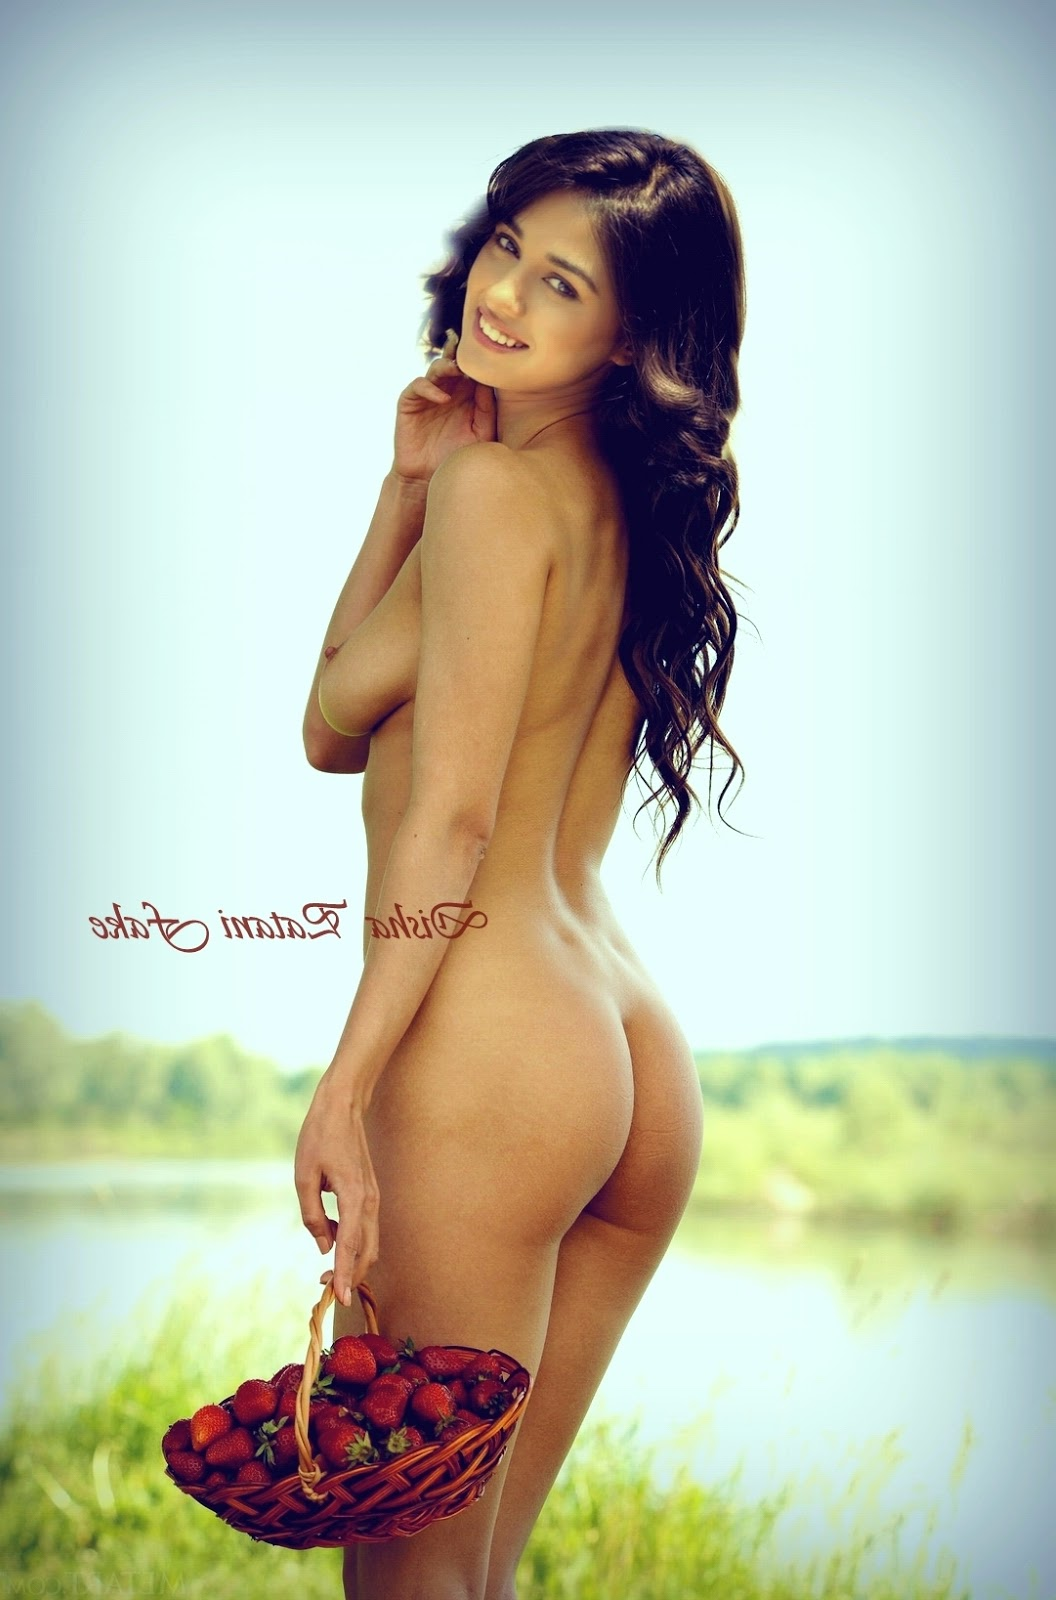 DishaPataniNakedOutDoor - Disha Patani Nude Boobs XXX Pussy Sex Photos